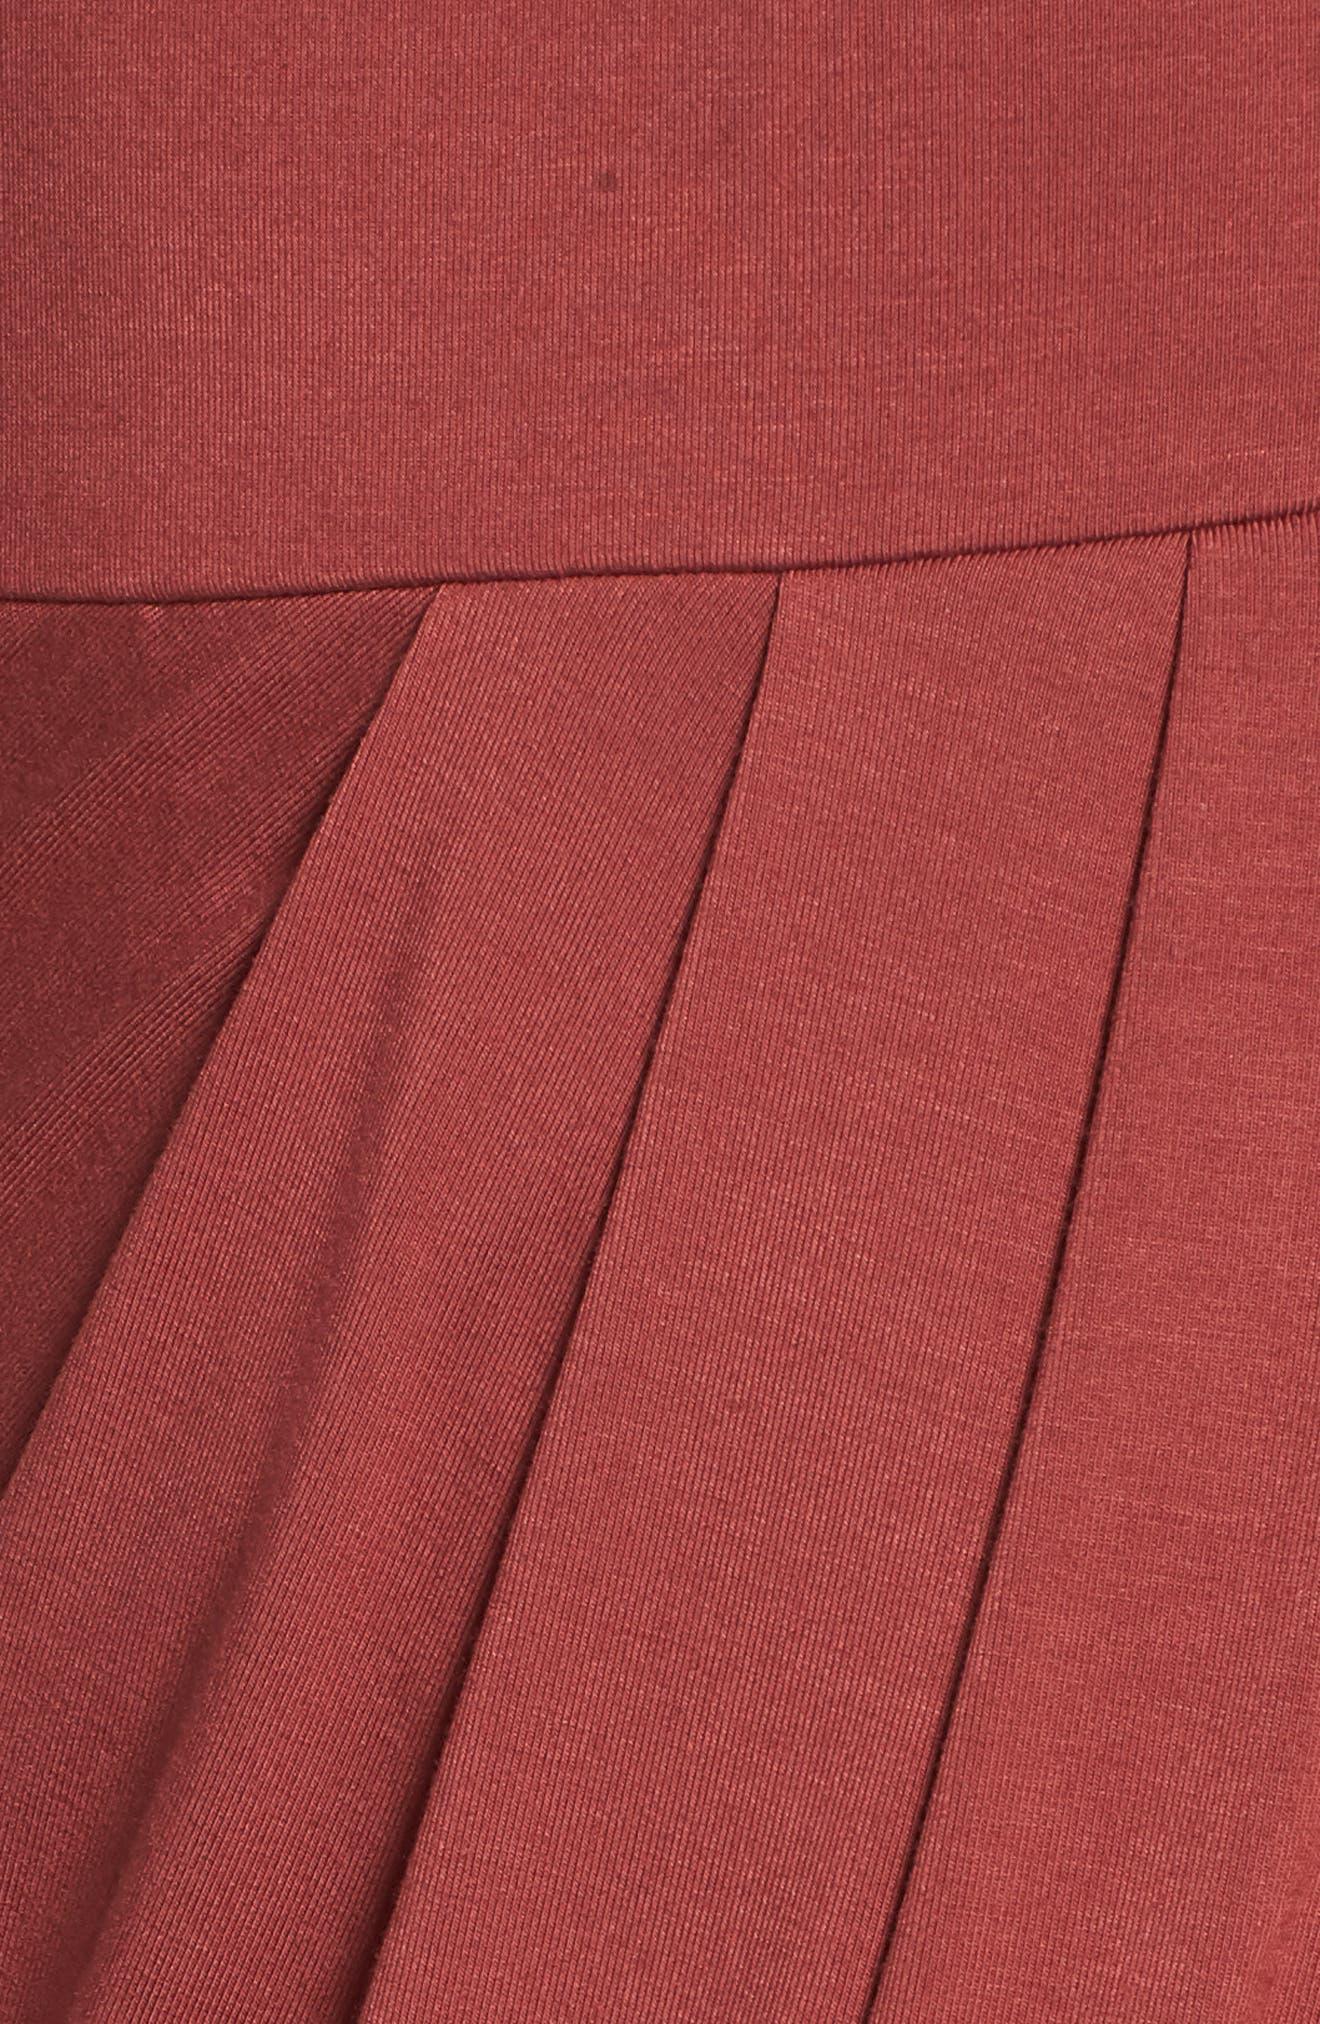 Pleated Wrap Dress,                             Alternate thumbnail 5, color,                             Rust Marsala